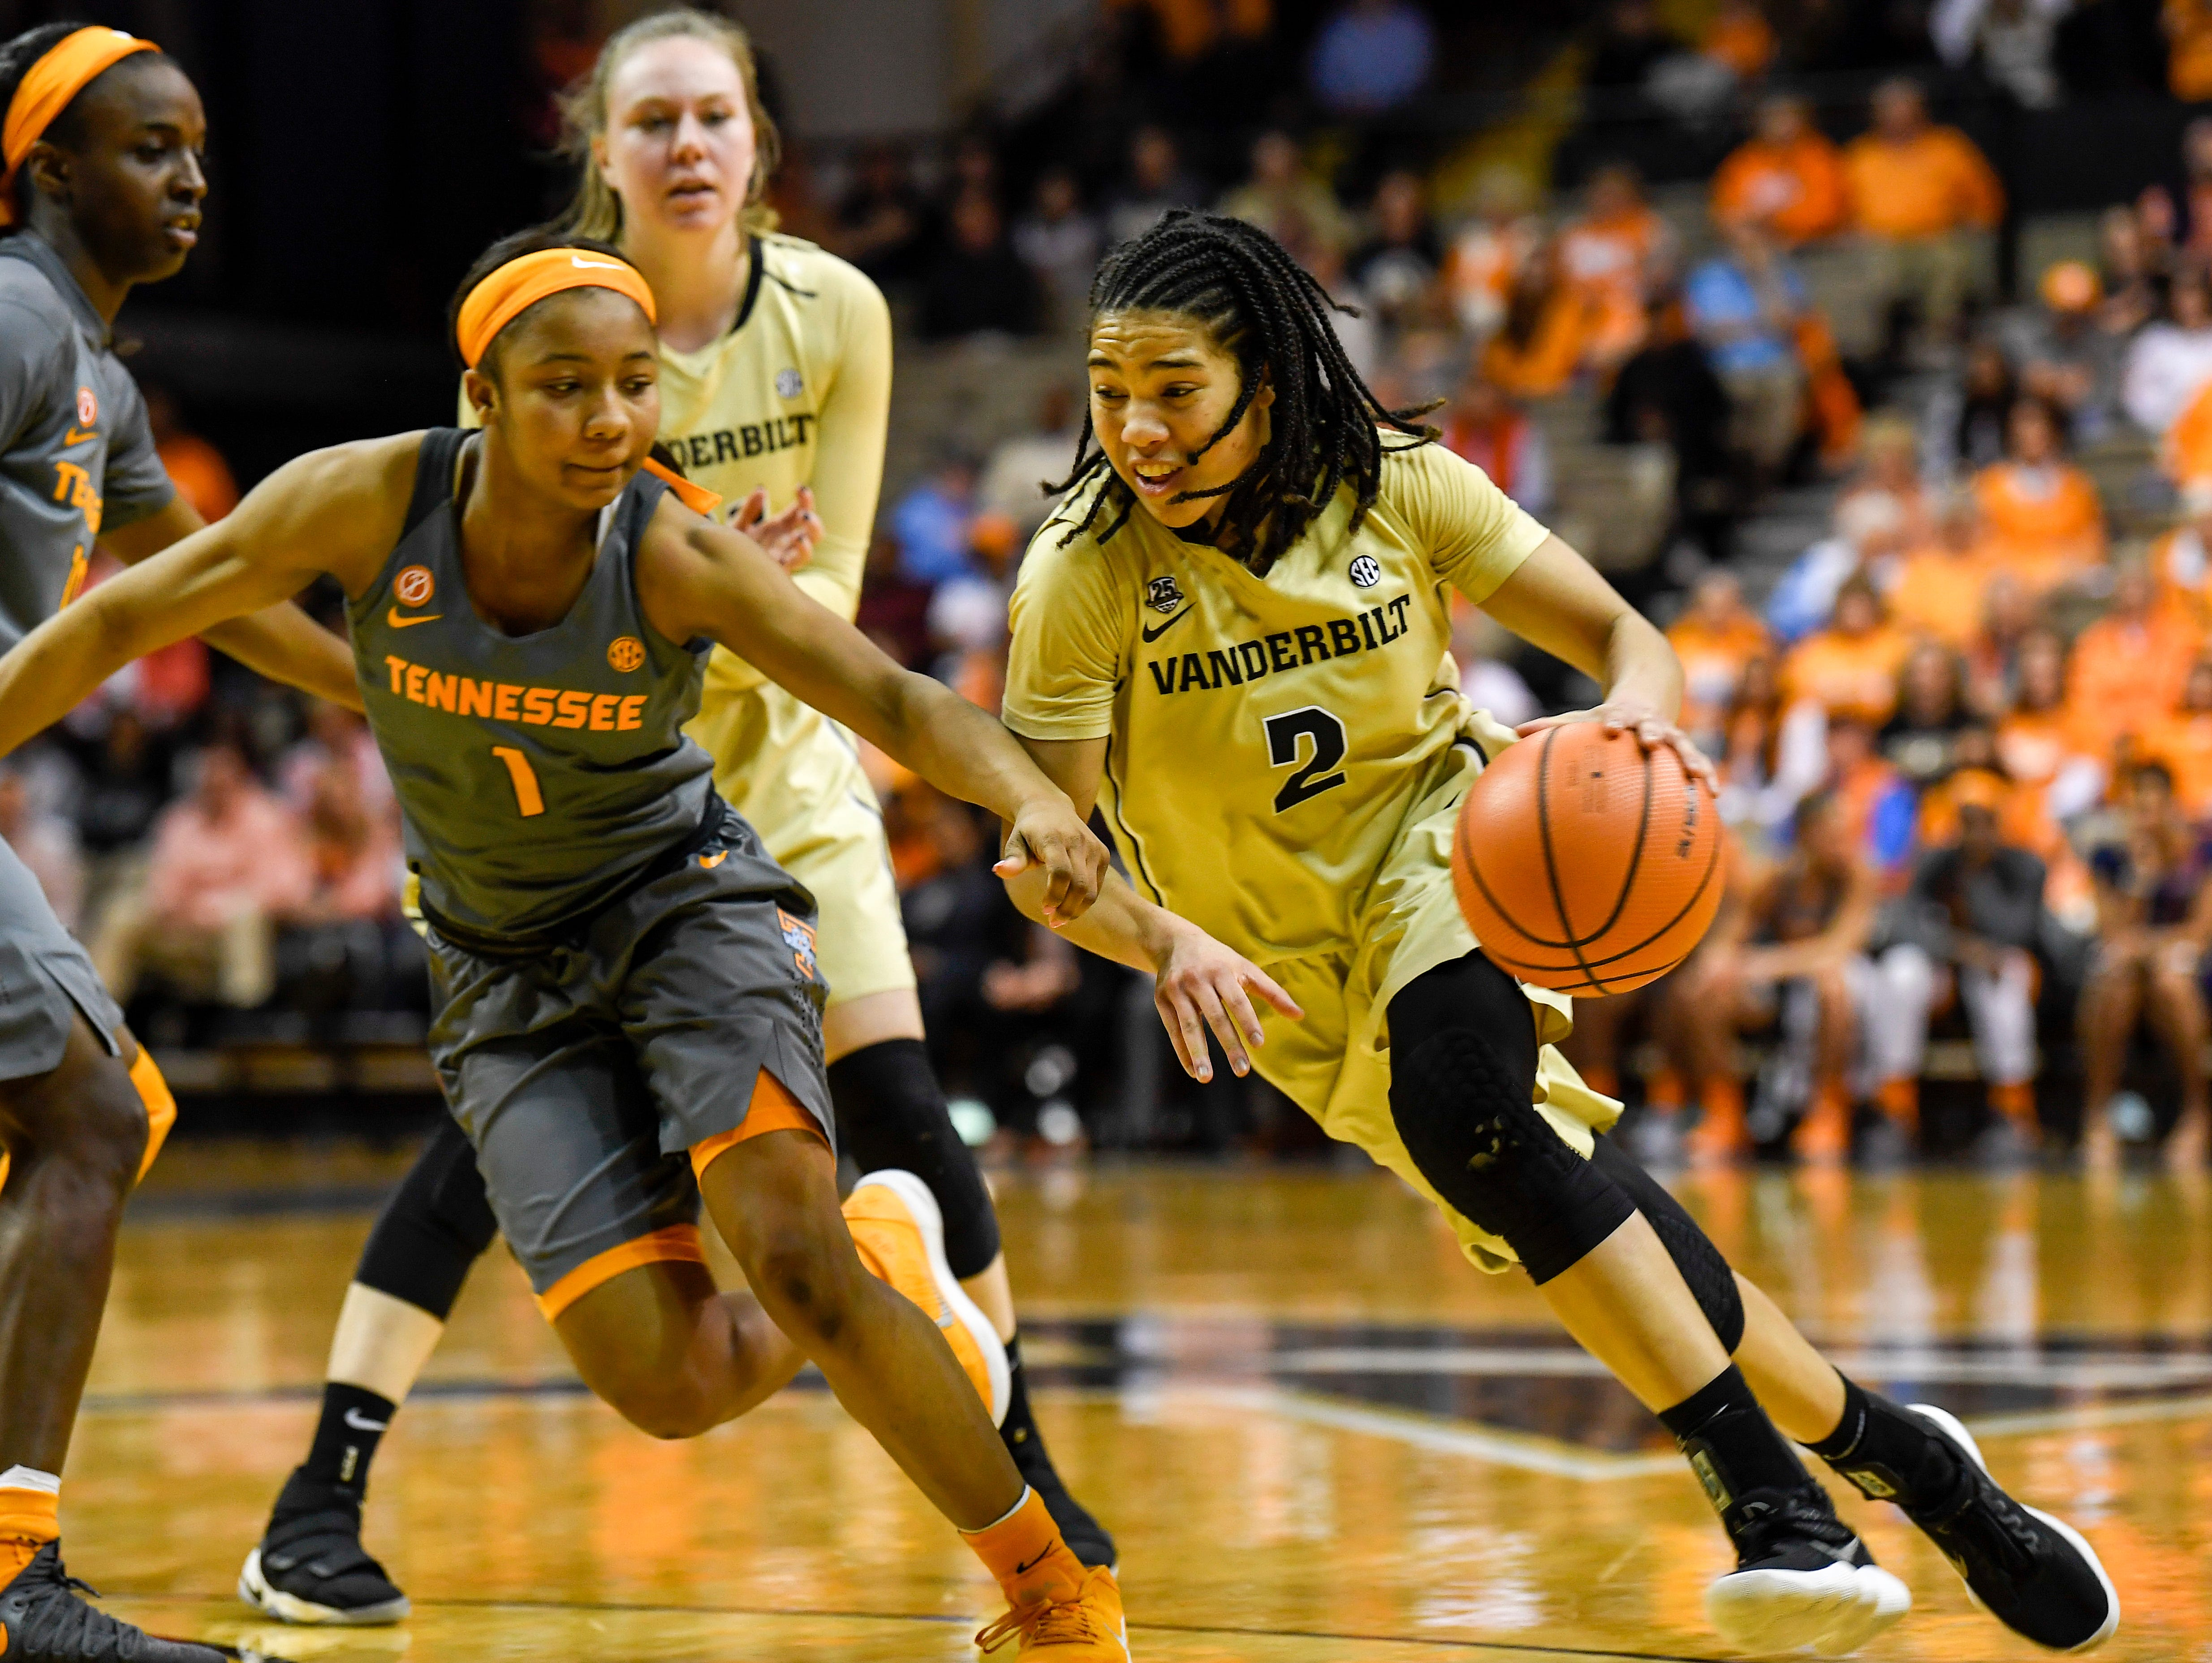 Tennessee Lady Vols Anastasia Hayes blocks Vanderbilt Commodores Chelsie Hall (2) during the second half of the game at the Vanderbilt Memorial Gymnasium in Nashville, Tenn., Sunday, Feb. 4, 2018.